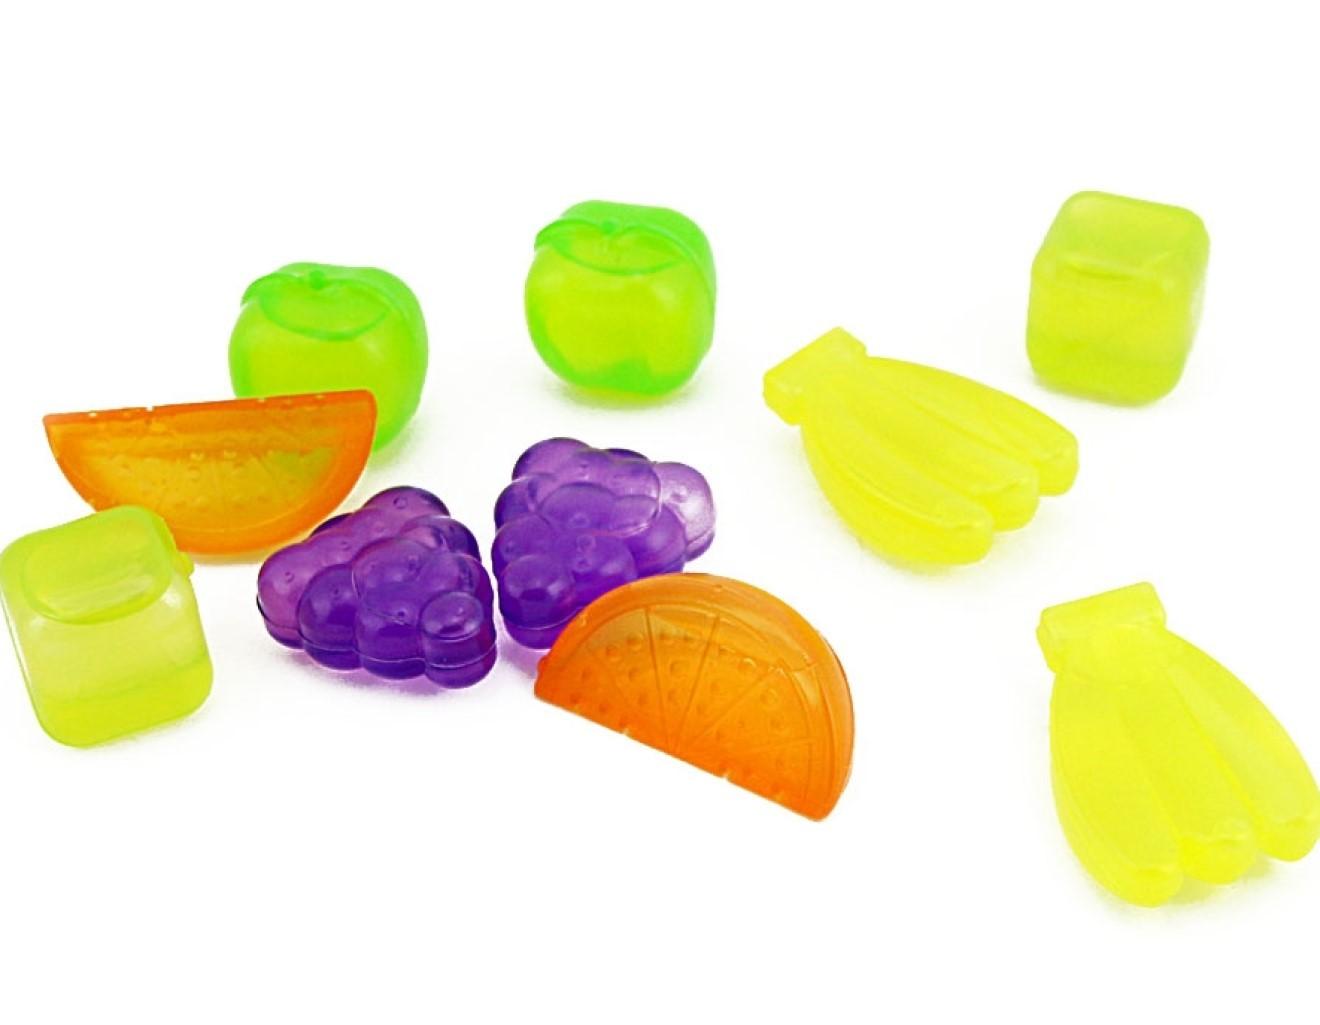 gelo artificial 10 cubos coloridos frutas reutilizaveis